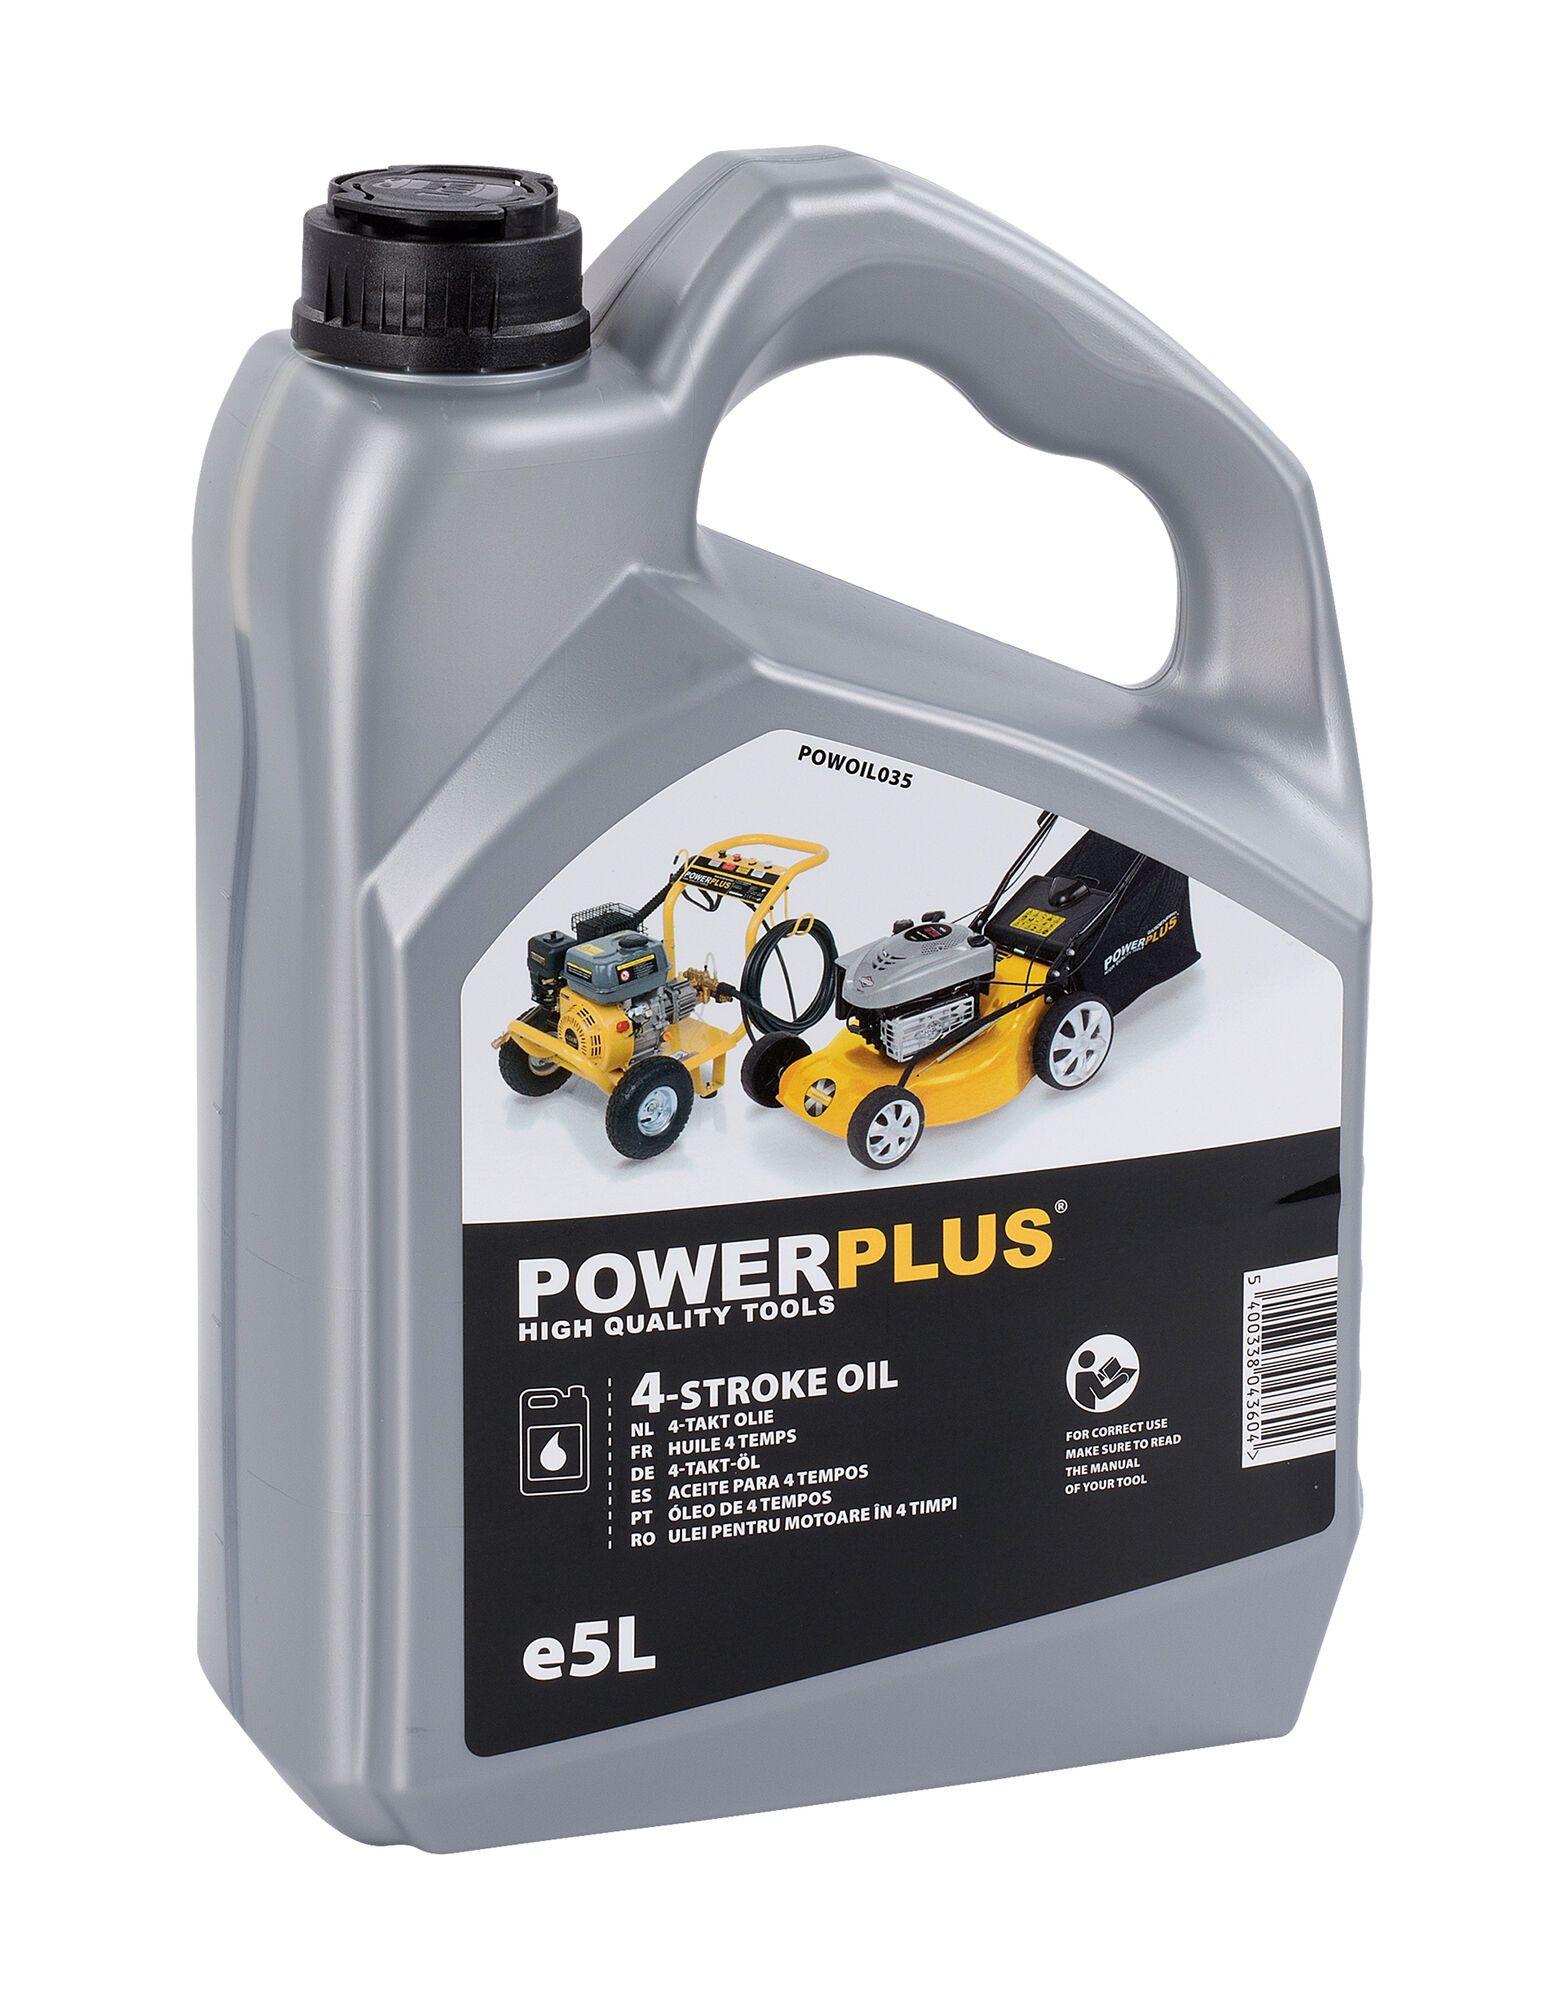 Powerplus POWOIL035 4-takt olie   5 liter olie voor 4-takt machines